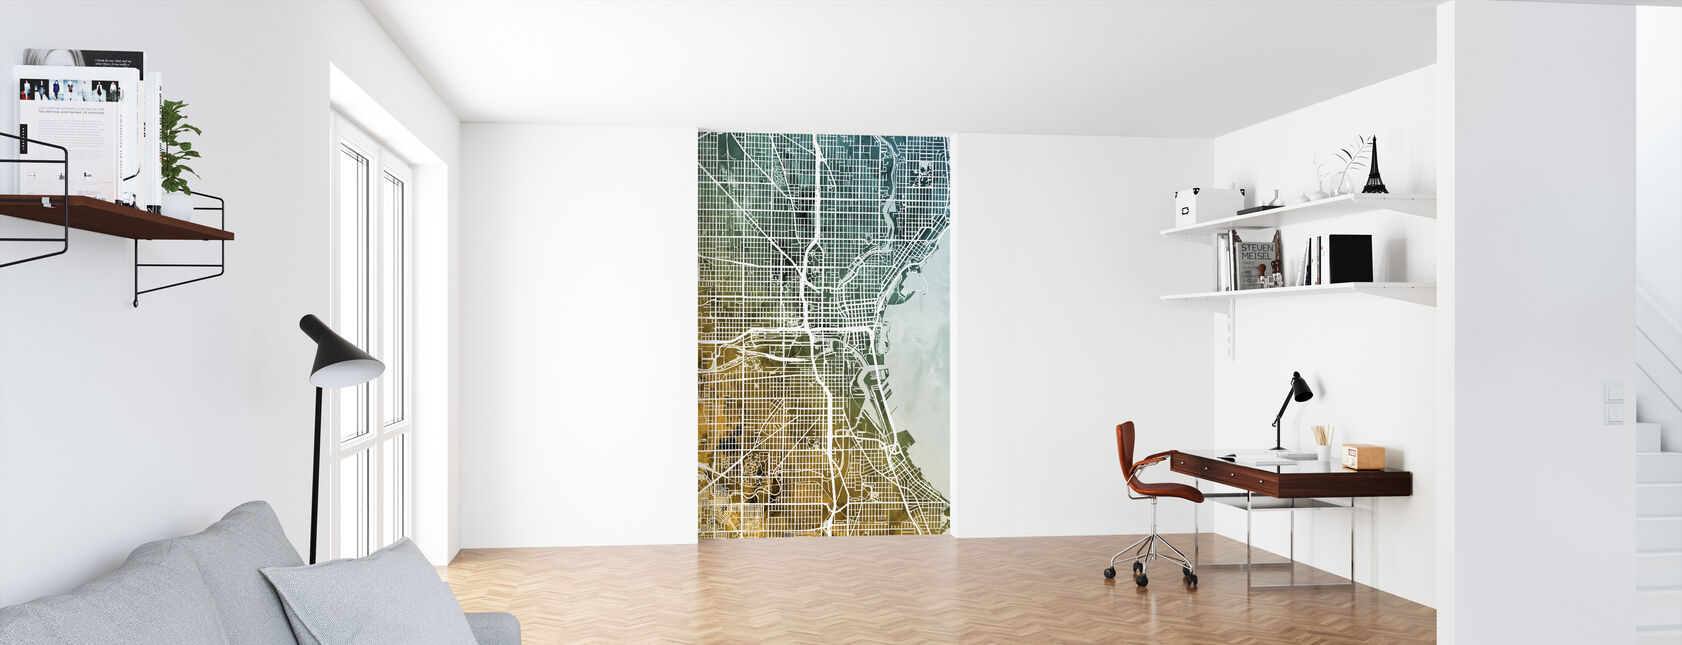 Milwaukee Wisconsin City Map - Wallpaper - Office